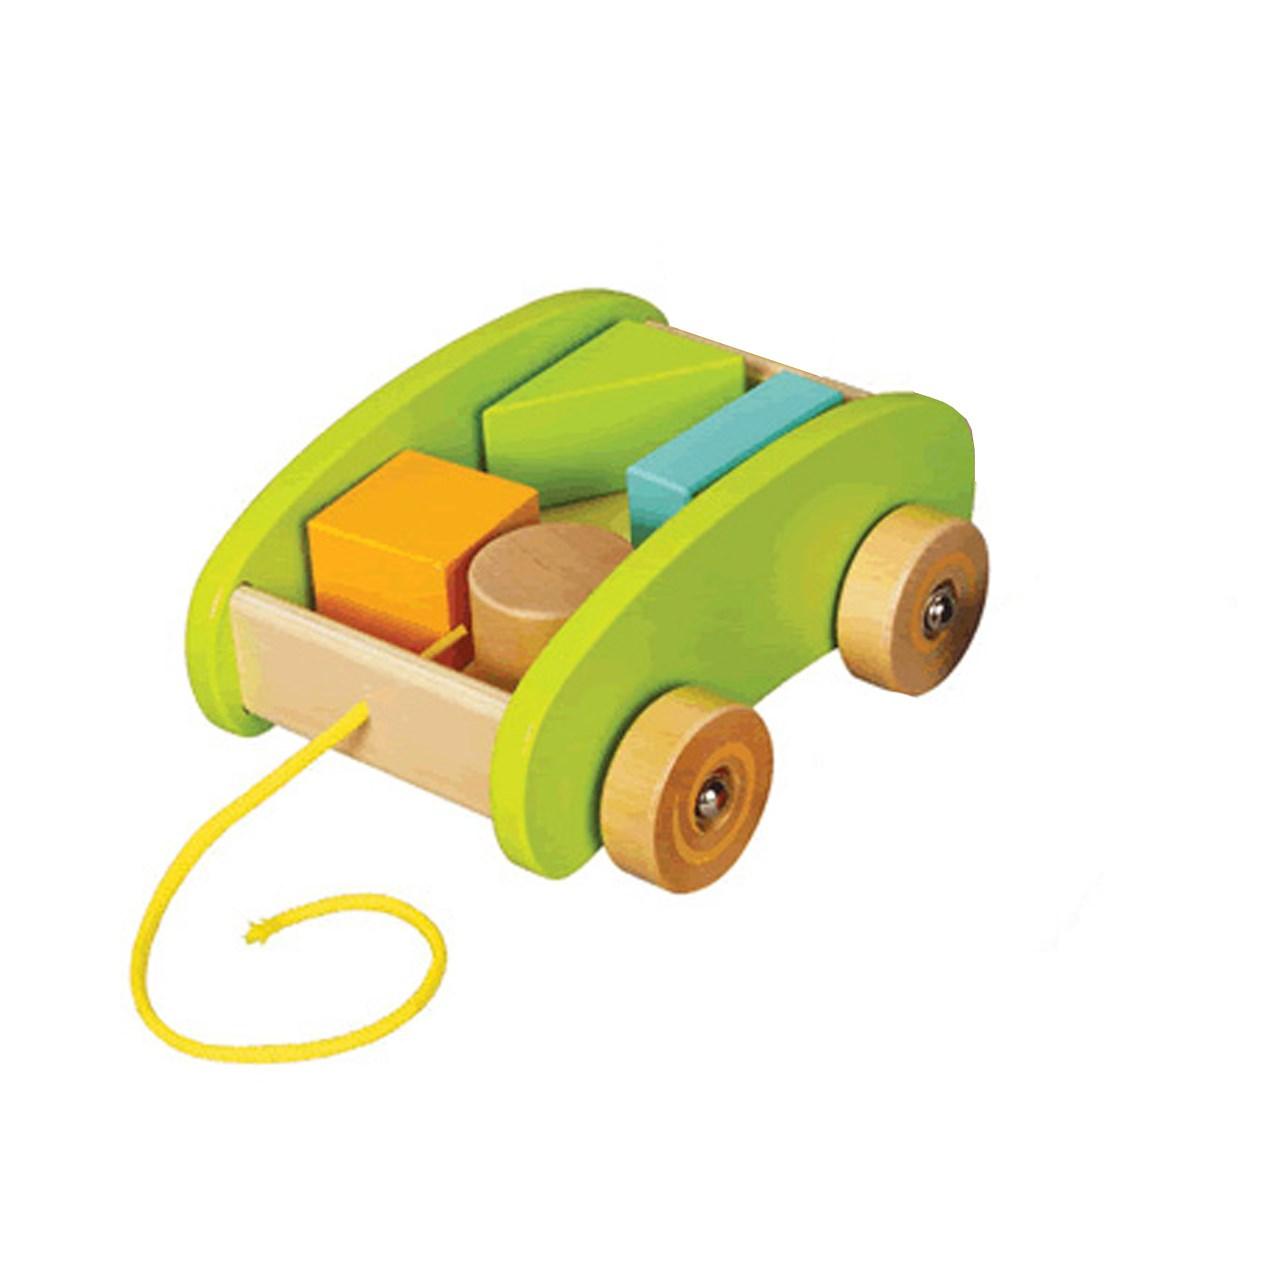 ماشین اشکال هپه مدل Roll